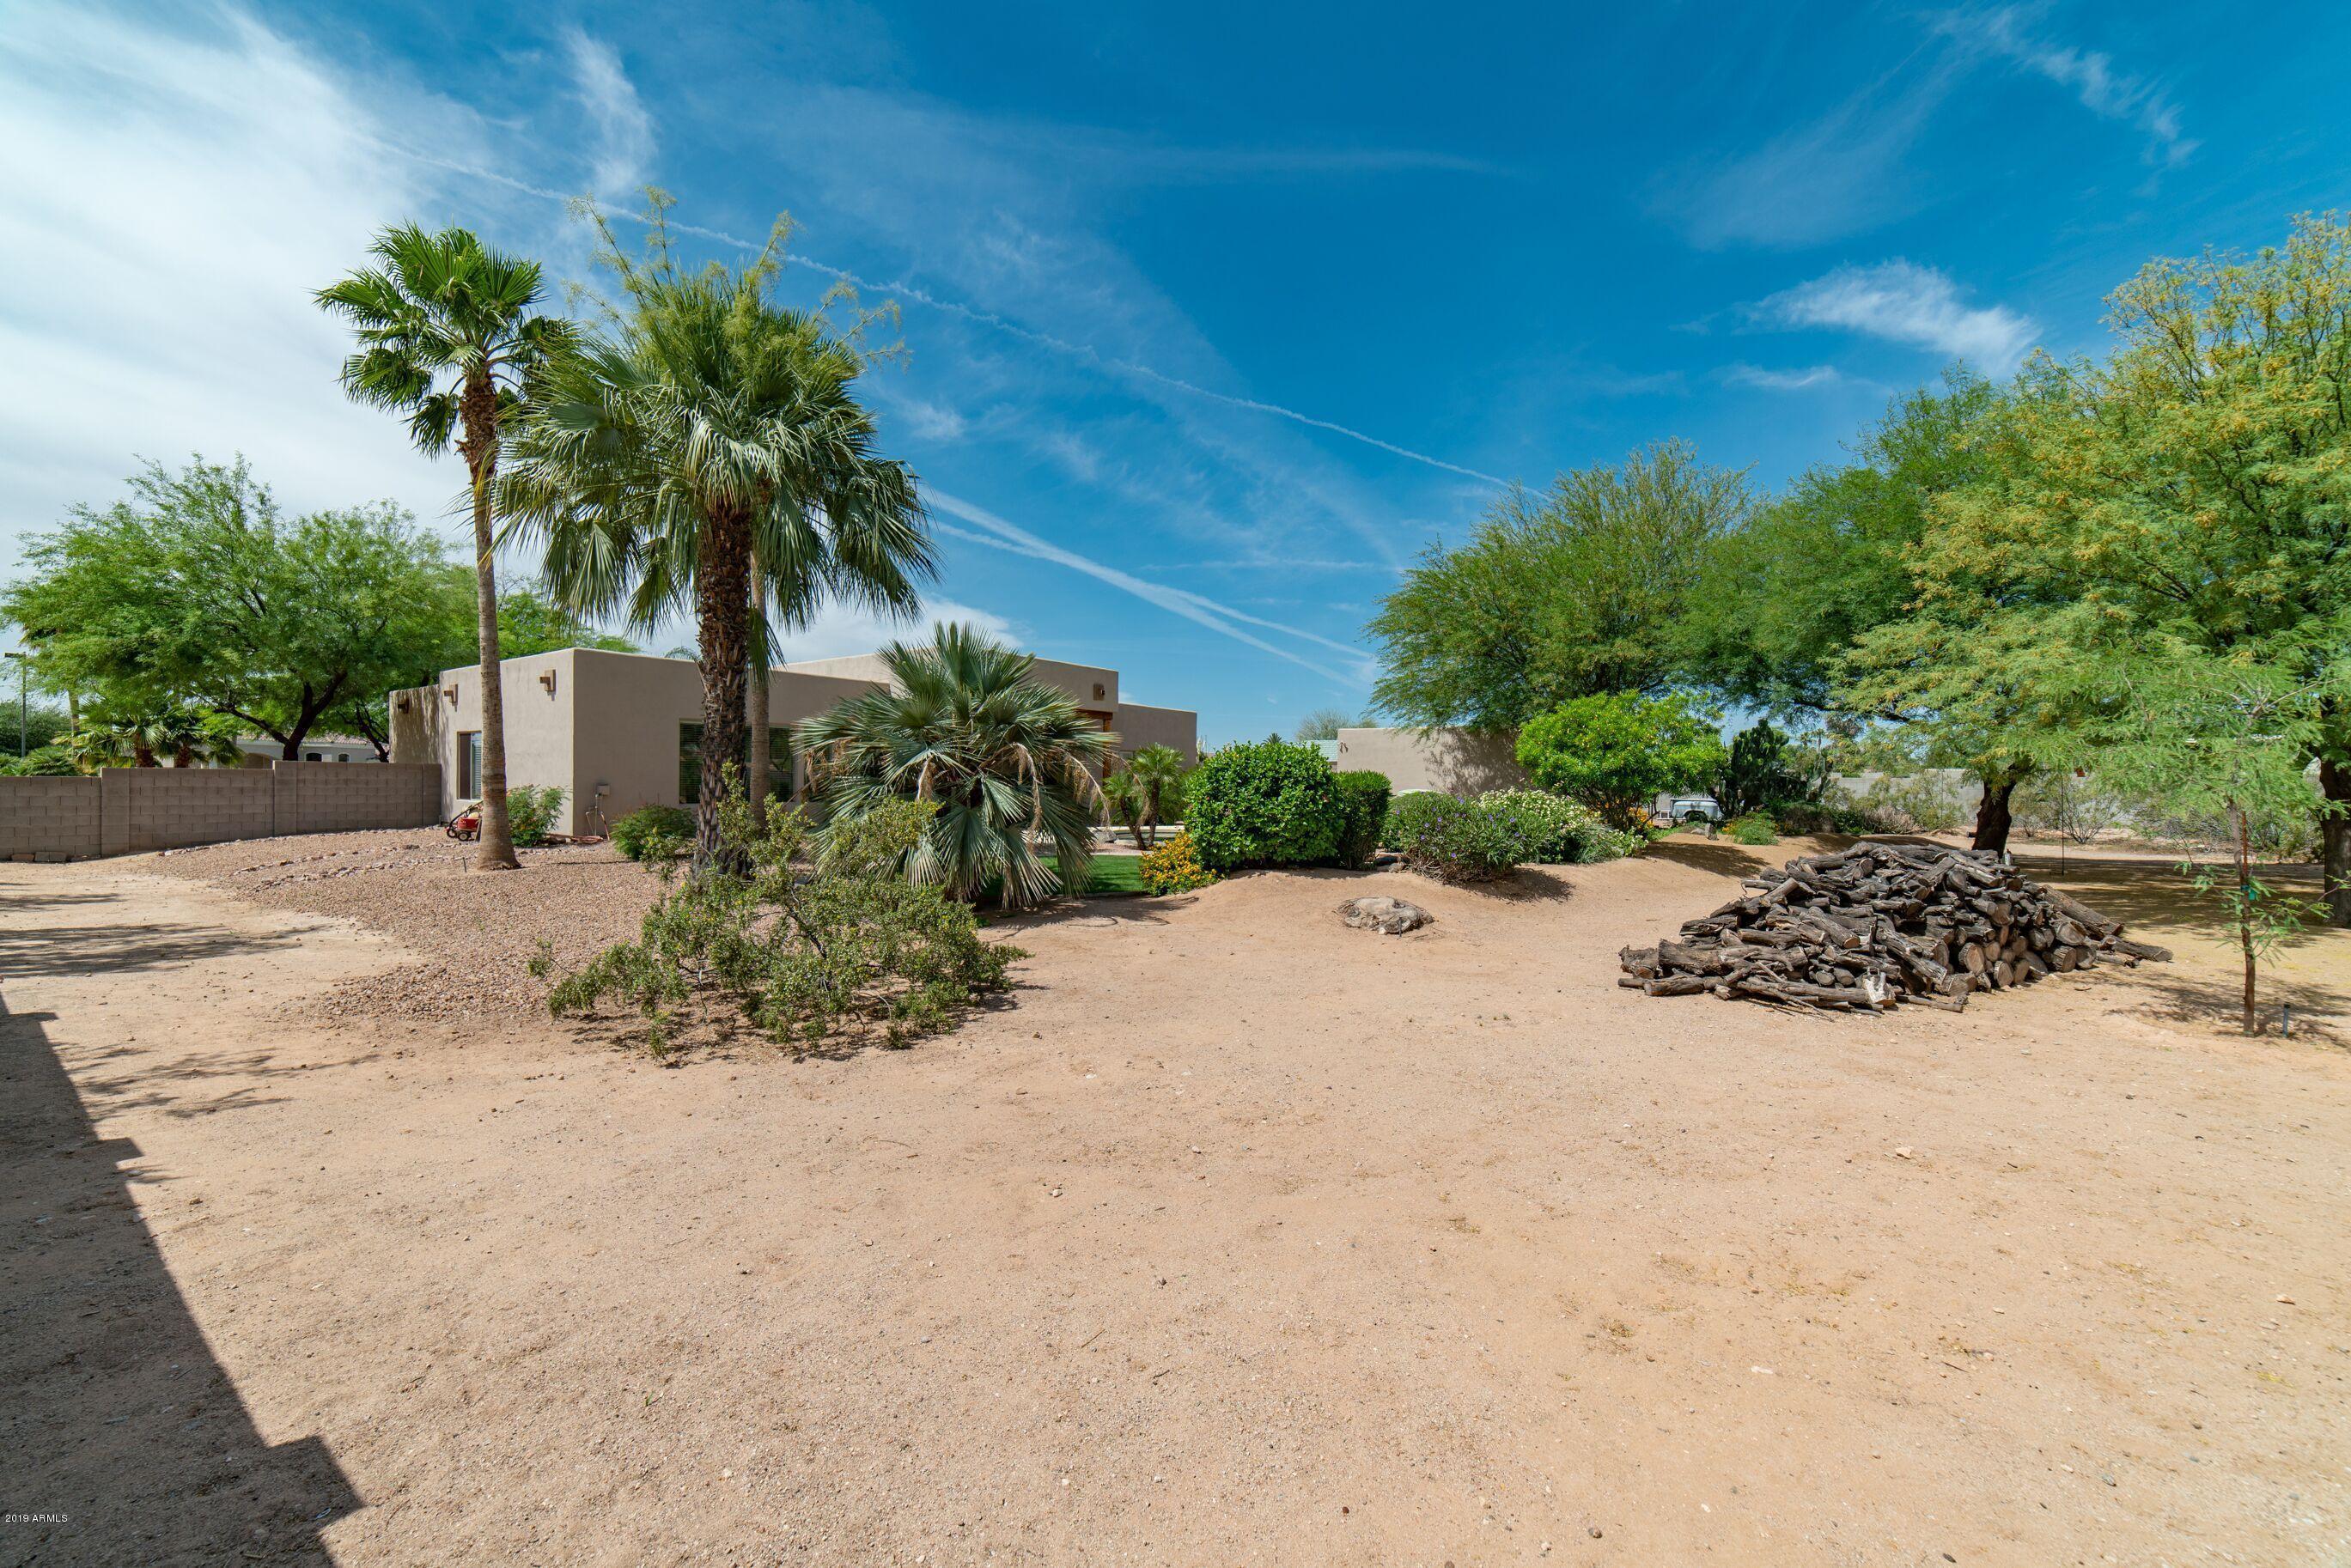 MLS 5921032 12818 W MISSOURI Avenue, Litchfield Park, AZ 85340 Litchfield Park AZ Litchfield Park